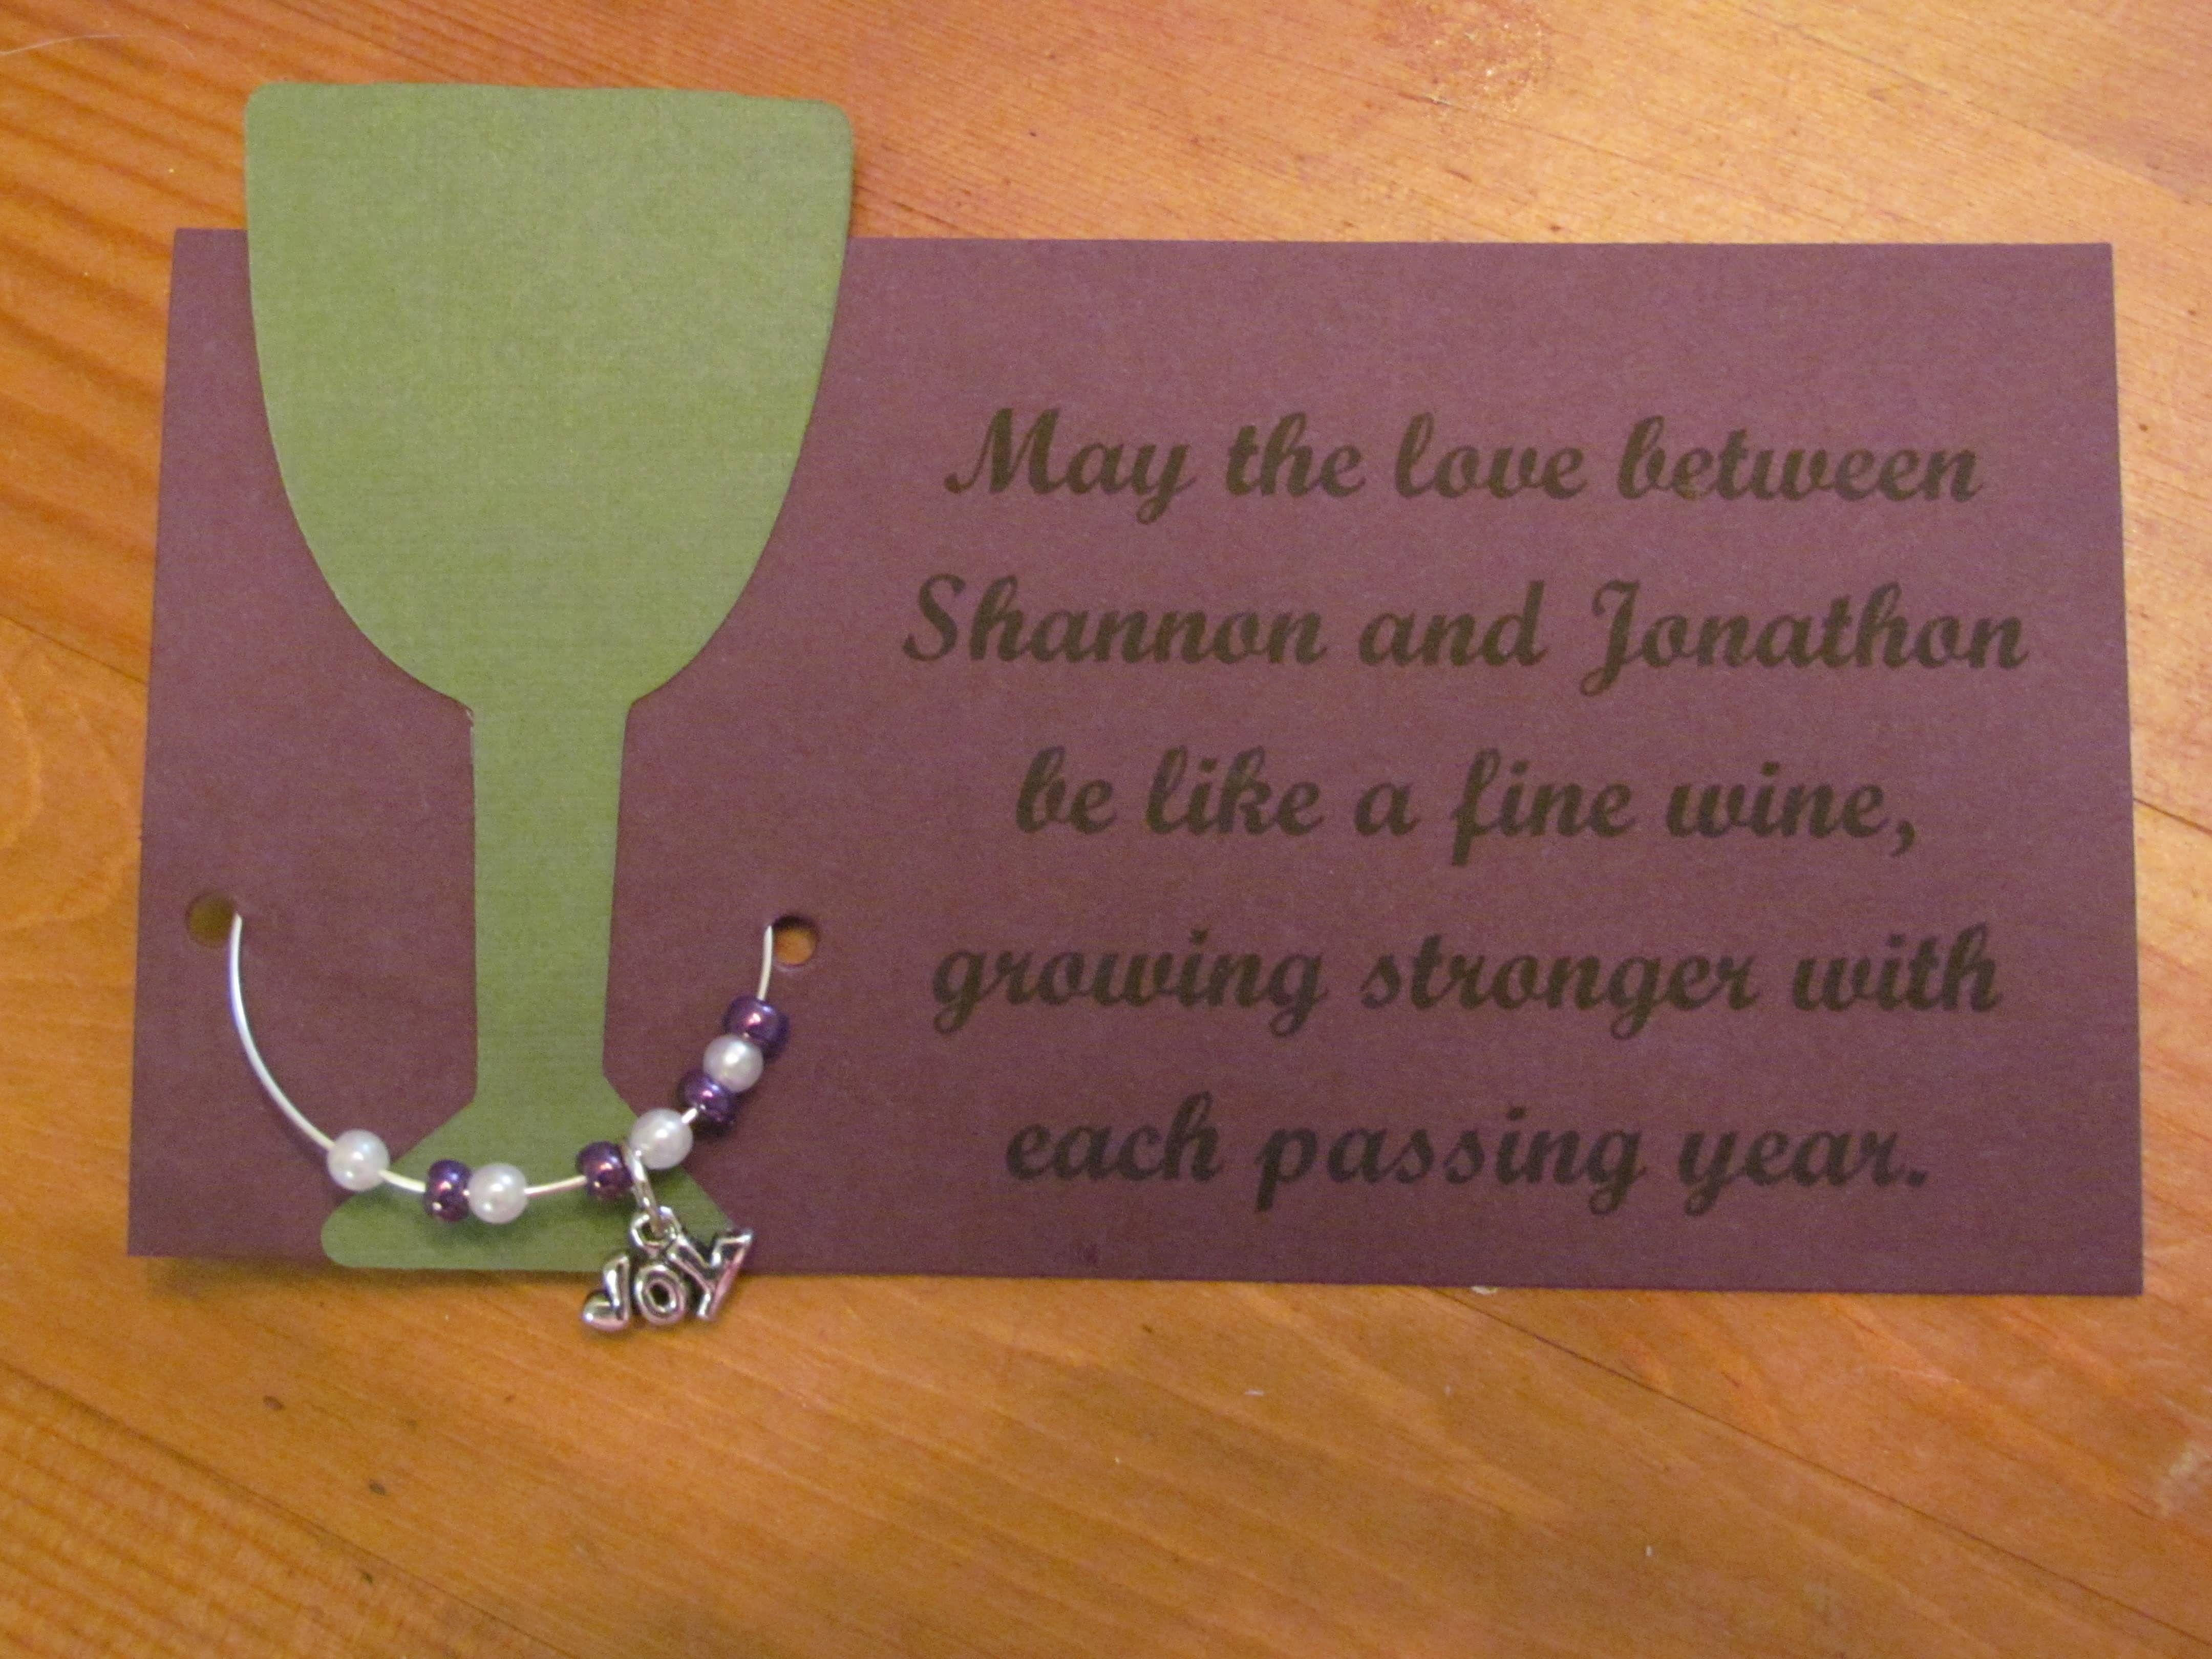 Bridal Shower Wine Poem | Bridal Shower Ideas | Pinterest | Bridal ...